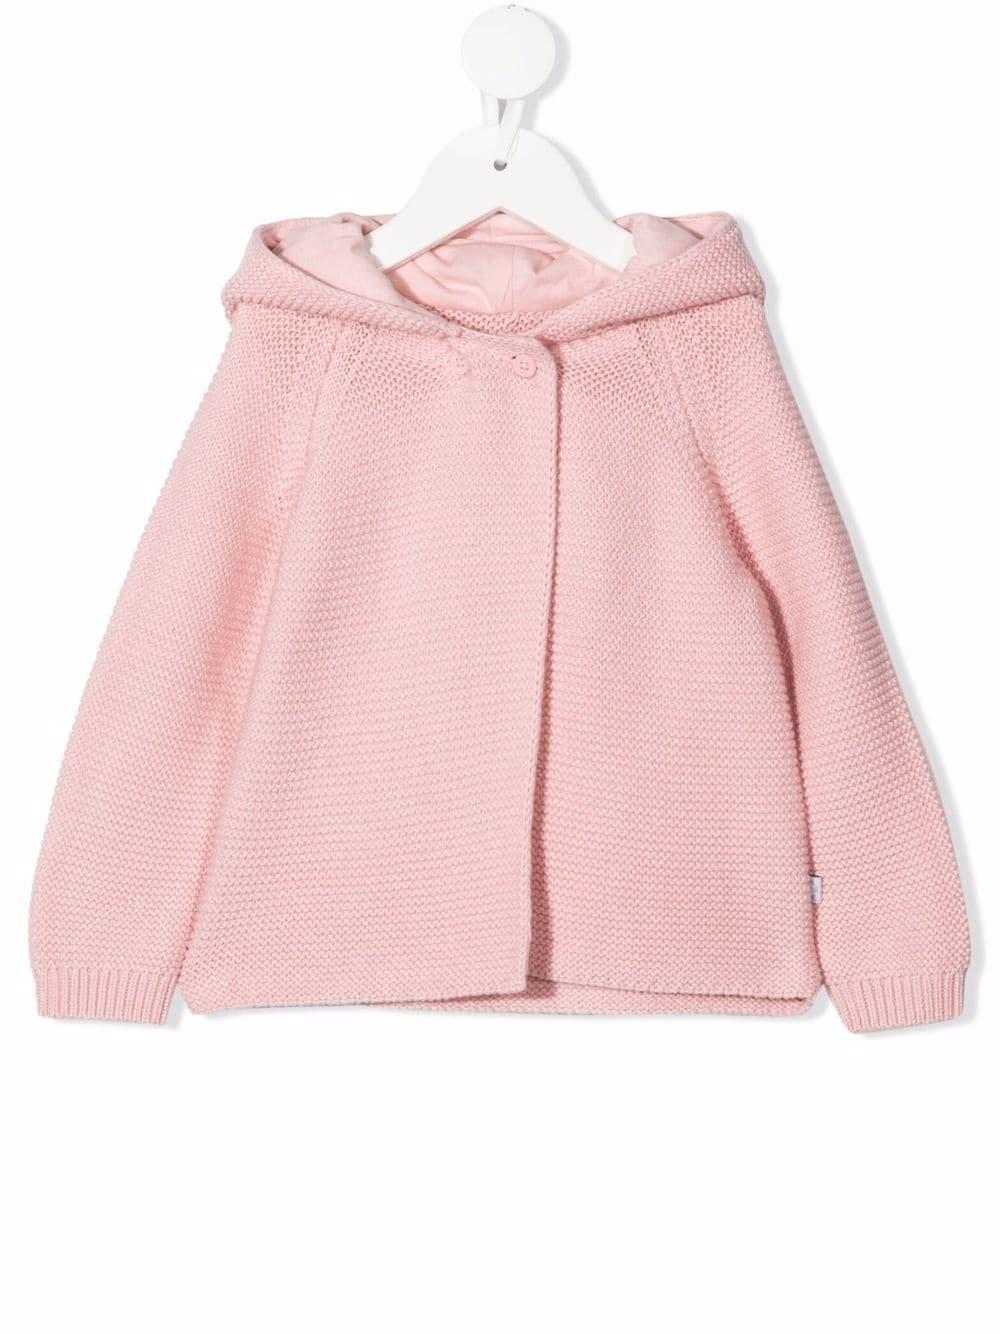 Coat Stella McCartney kids STELLA MCCARTNEY KIDS | 1 | 603523SRM105563